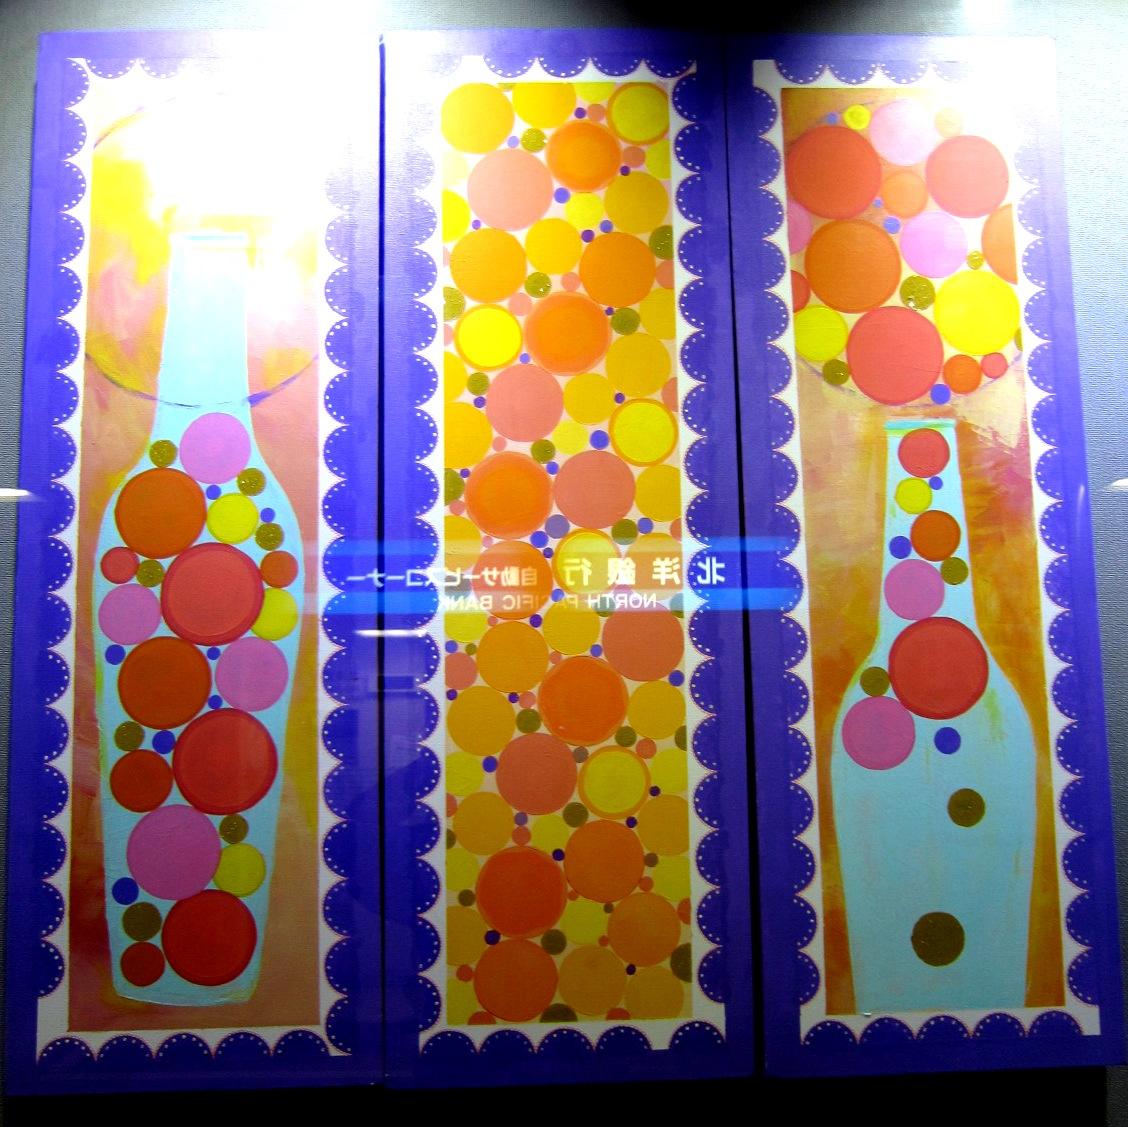 2216)「(YUKO個展)コトノハエマキinメトロギャラリ-」 円山公園駅メトロg. 9月4日(水)~9月26日(木) _f0126829_0102749.jpg